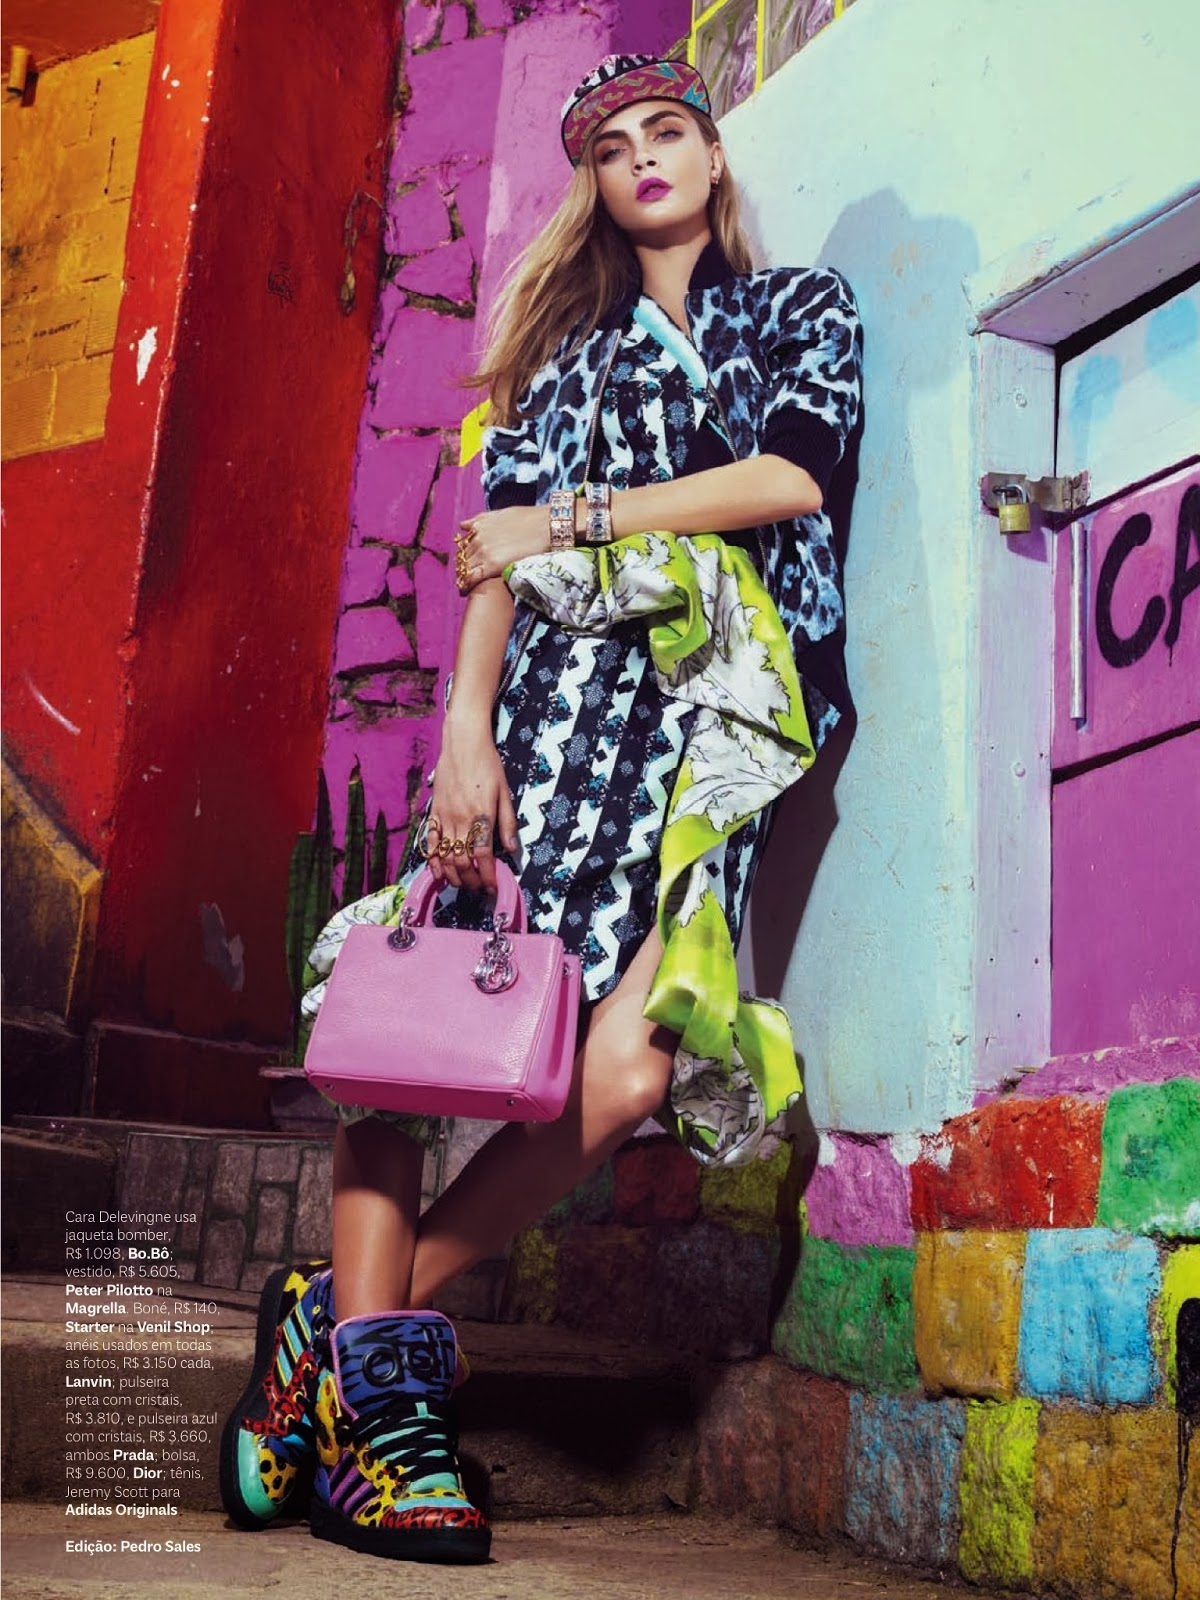 Hola Bola Babes: And baby Ill rule // Cara @ Vogue Brasil